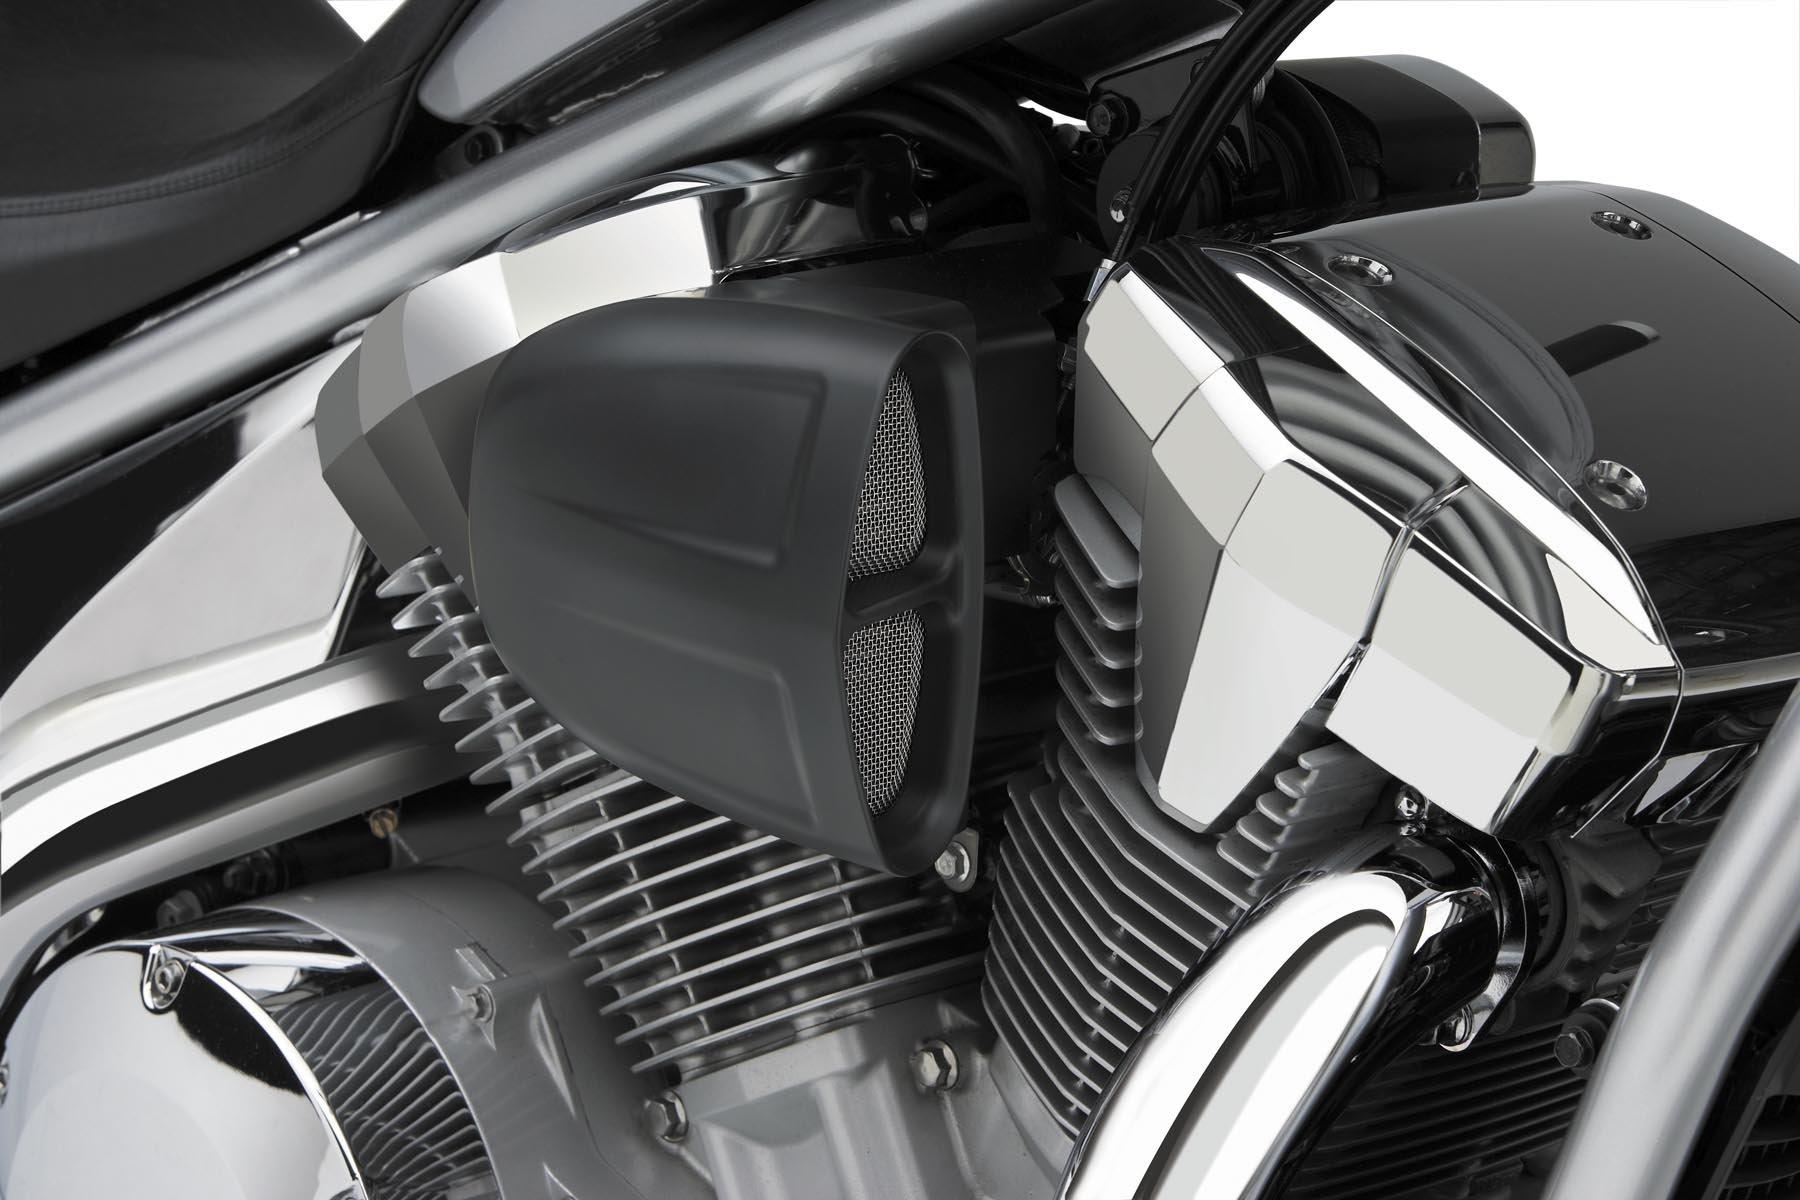 Cobra PowrFlo Air Cleaner System Black 06-0467B